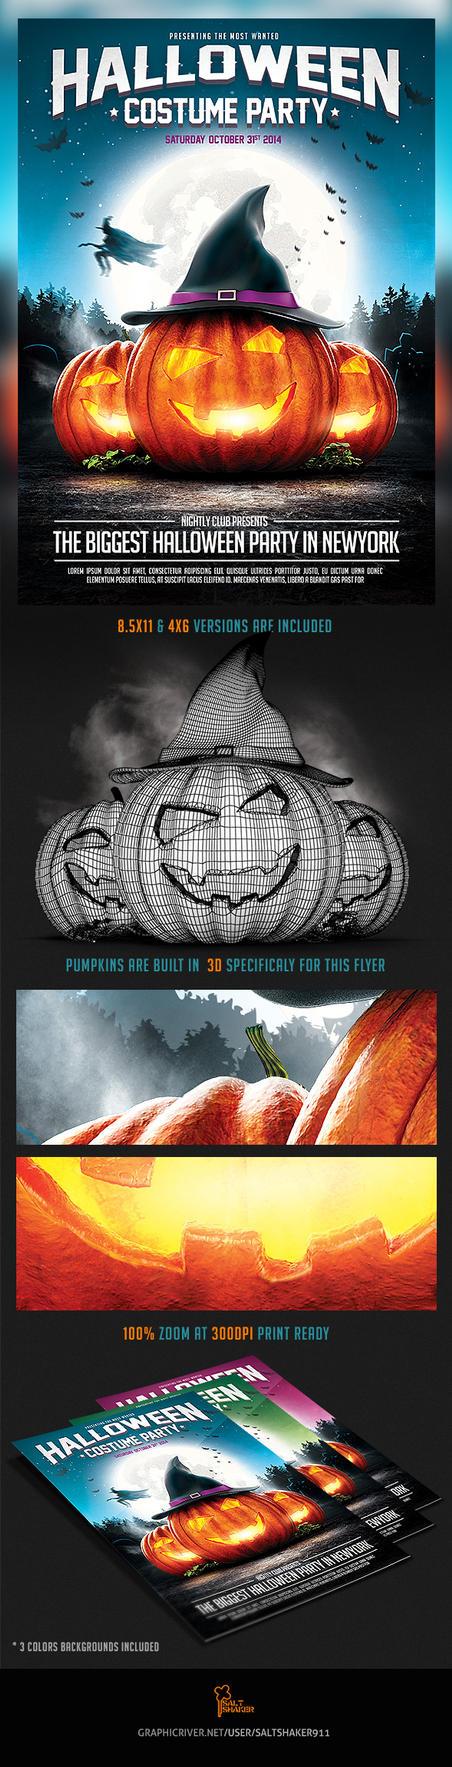 Halloween Party Flyer v.2 by saltshaker911